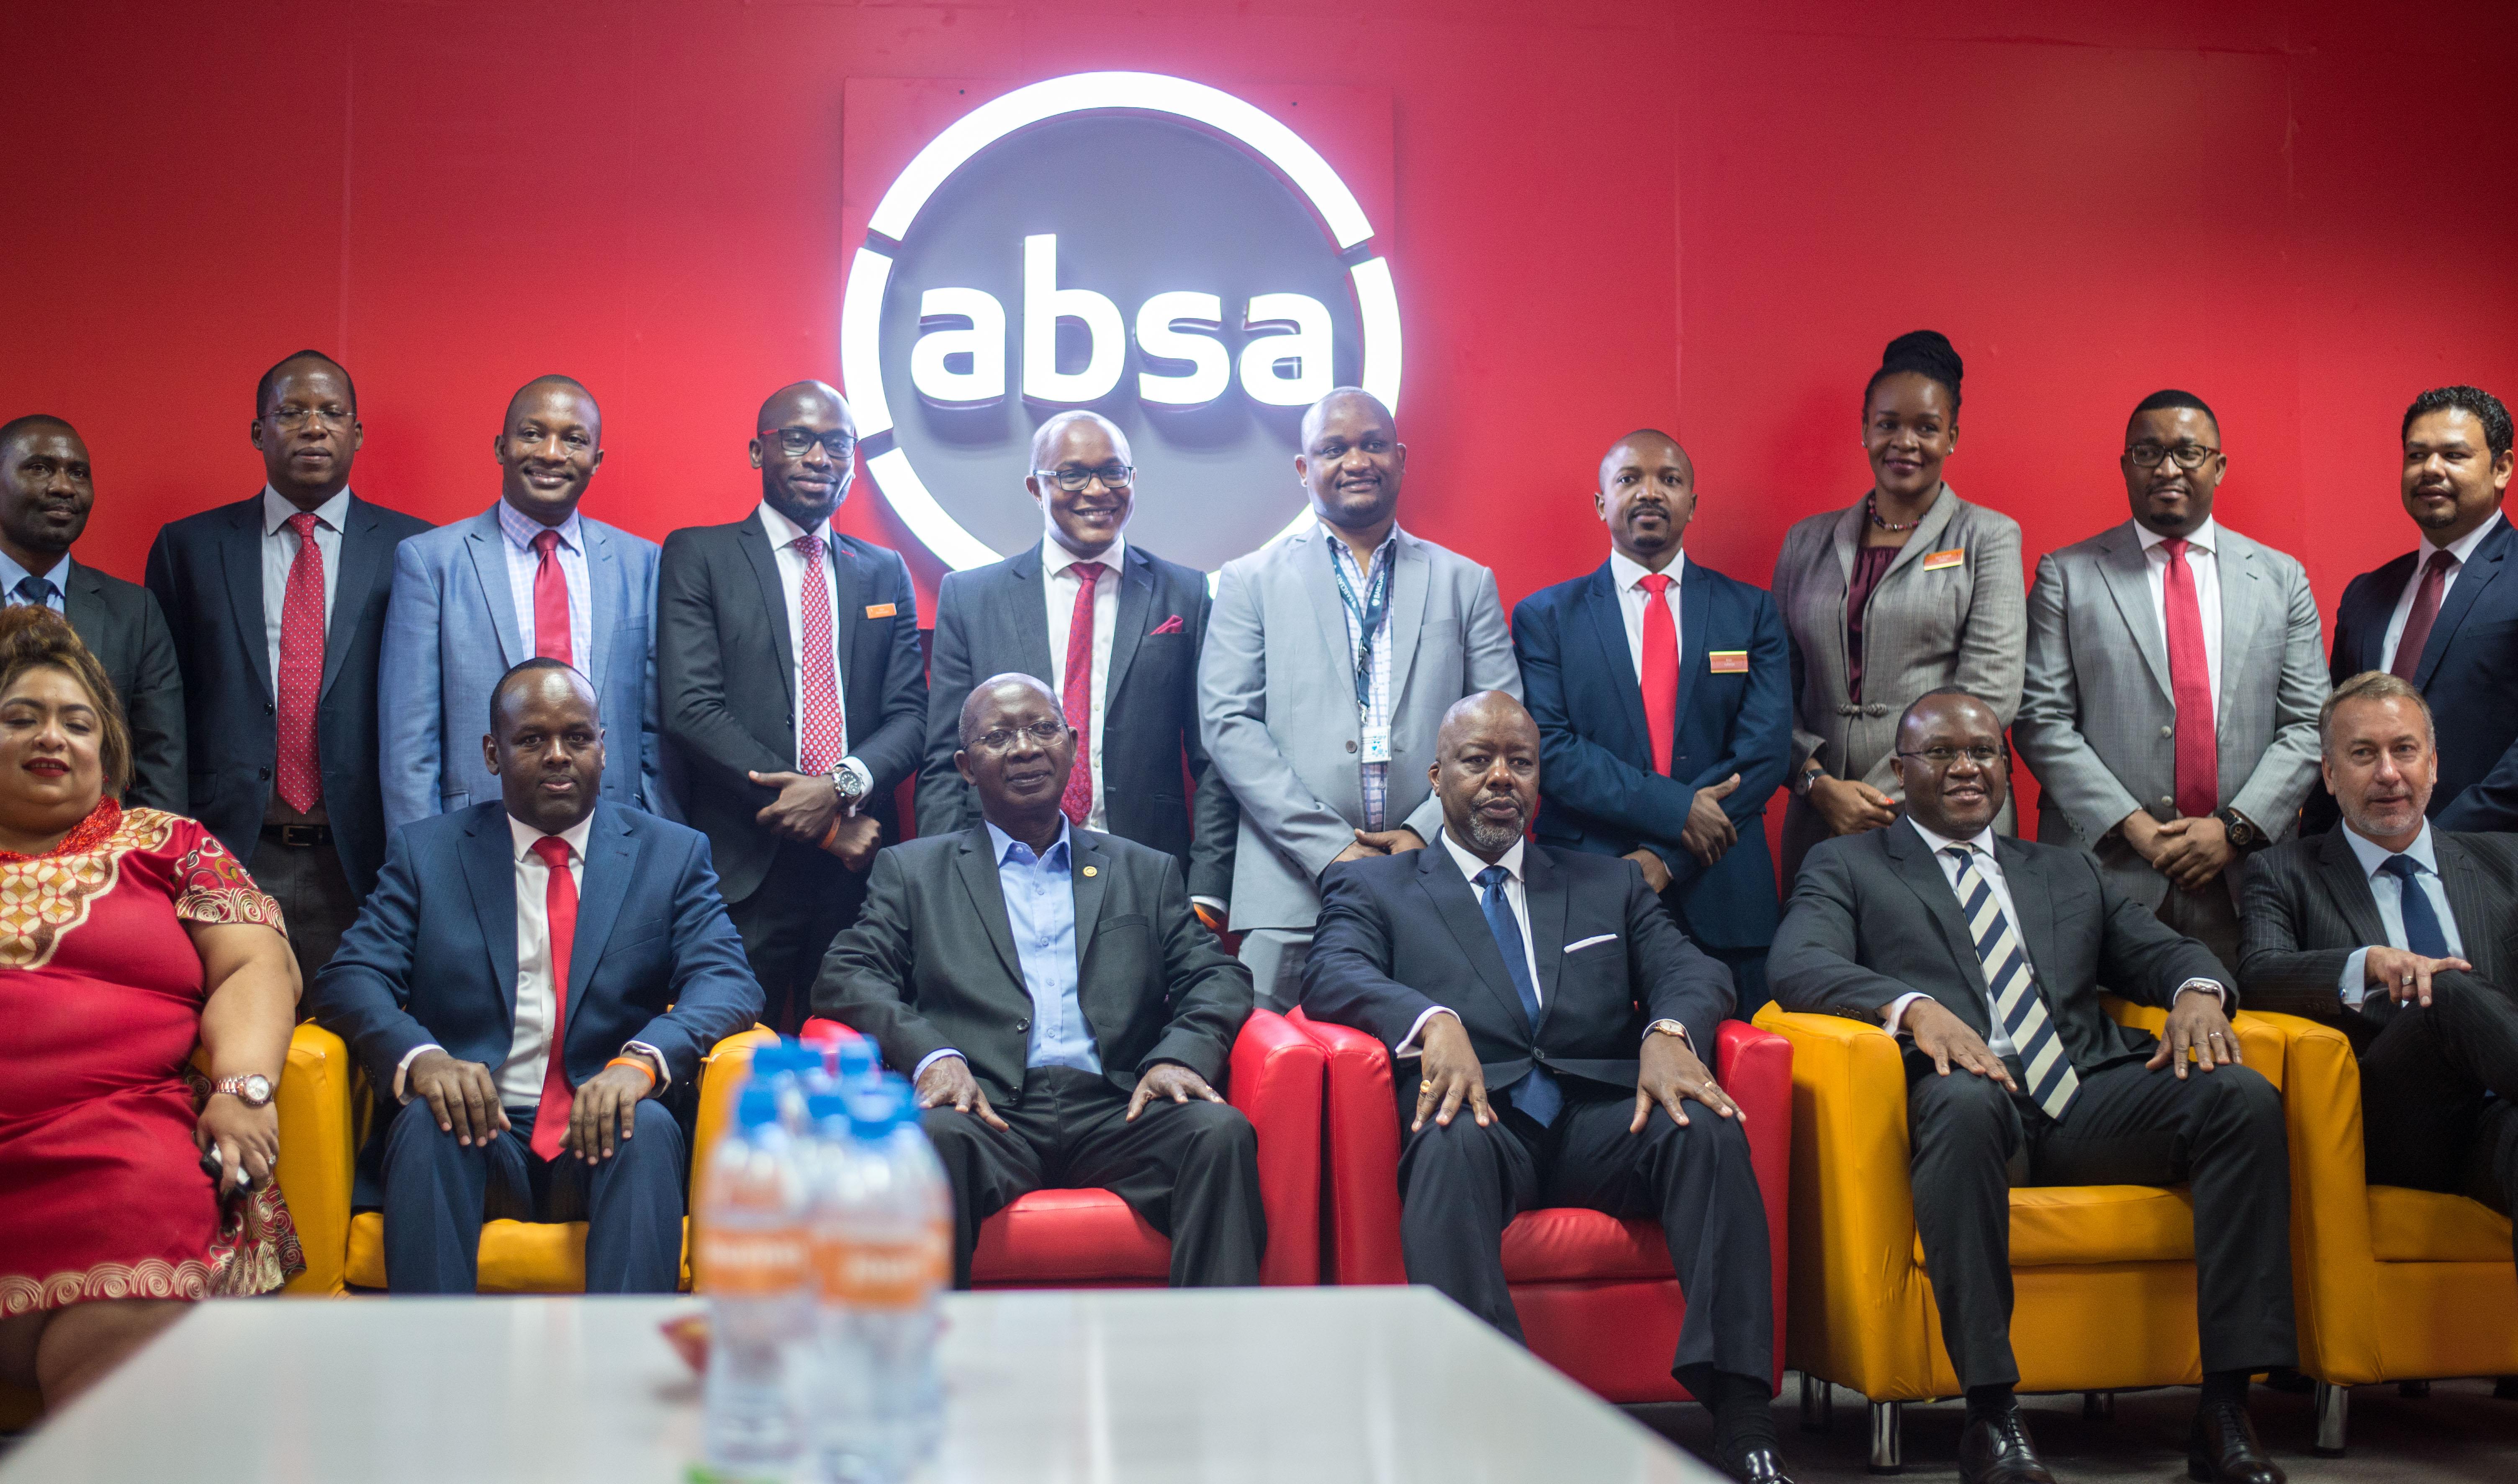 Journey To ABSA – Barclays Bank Tanzania